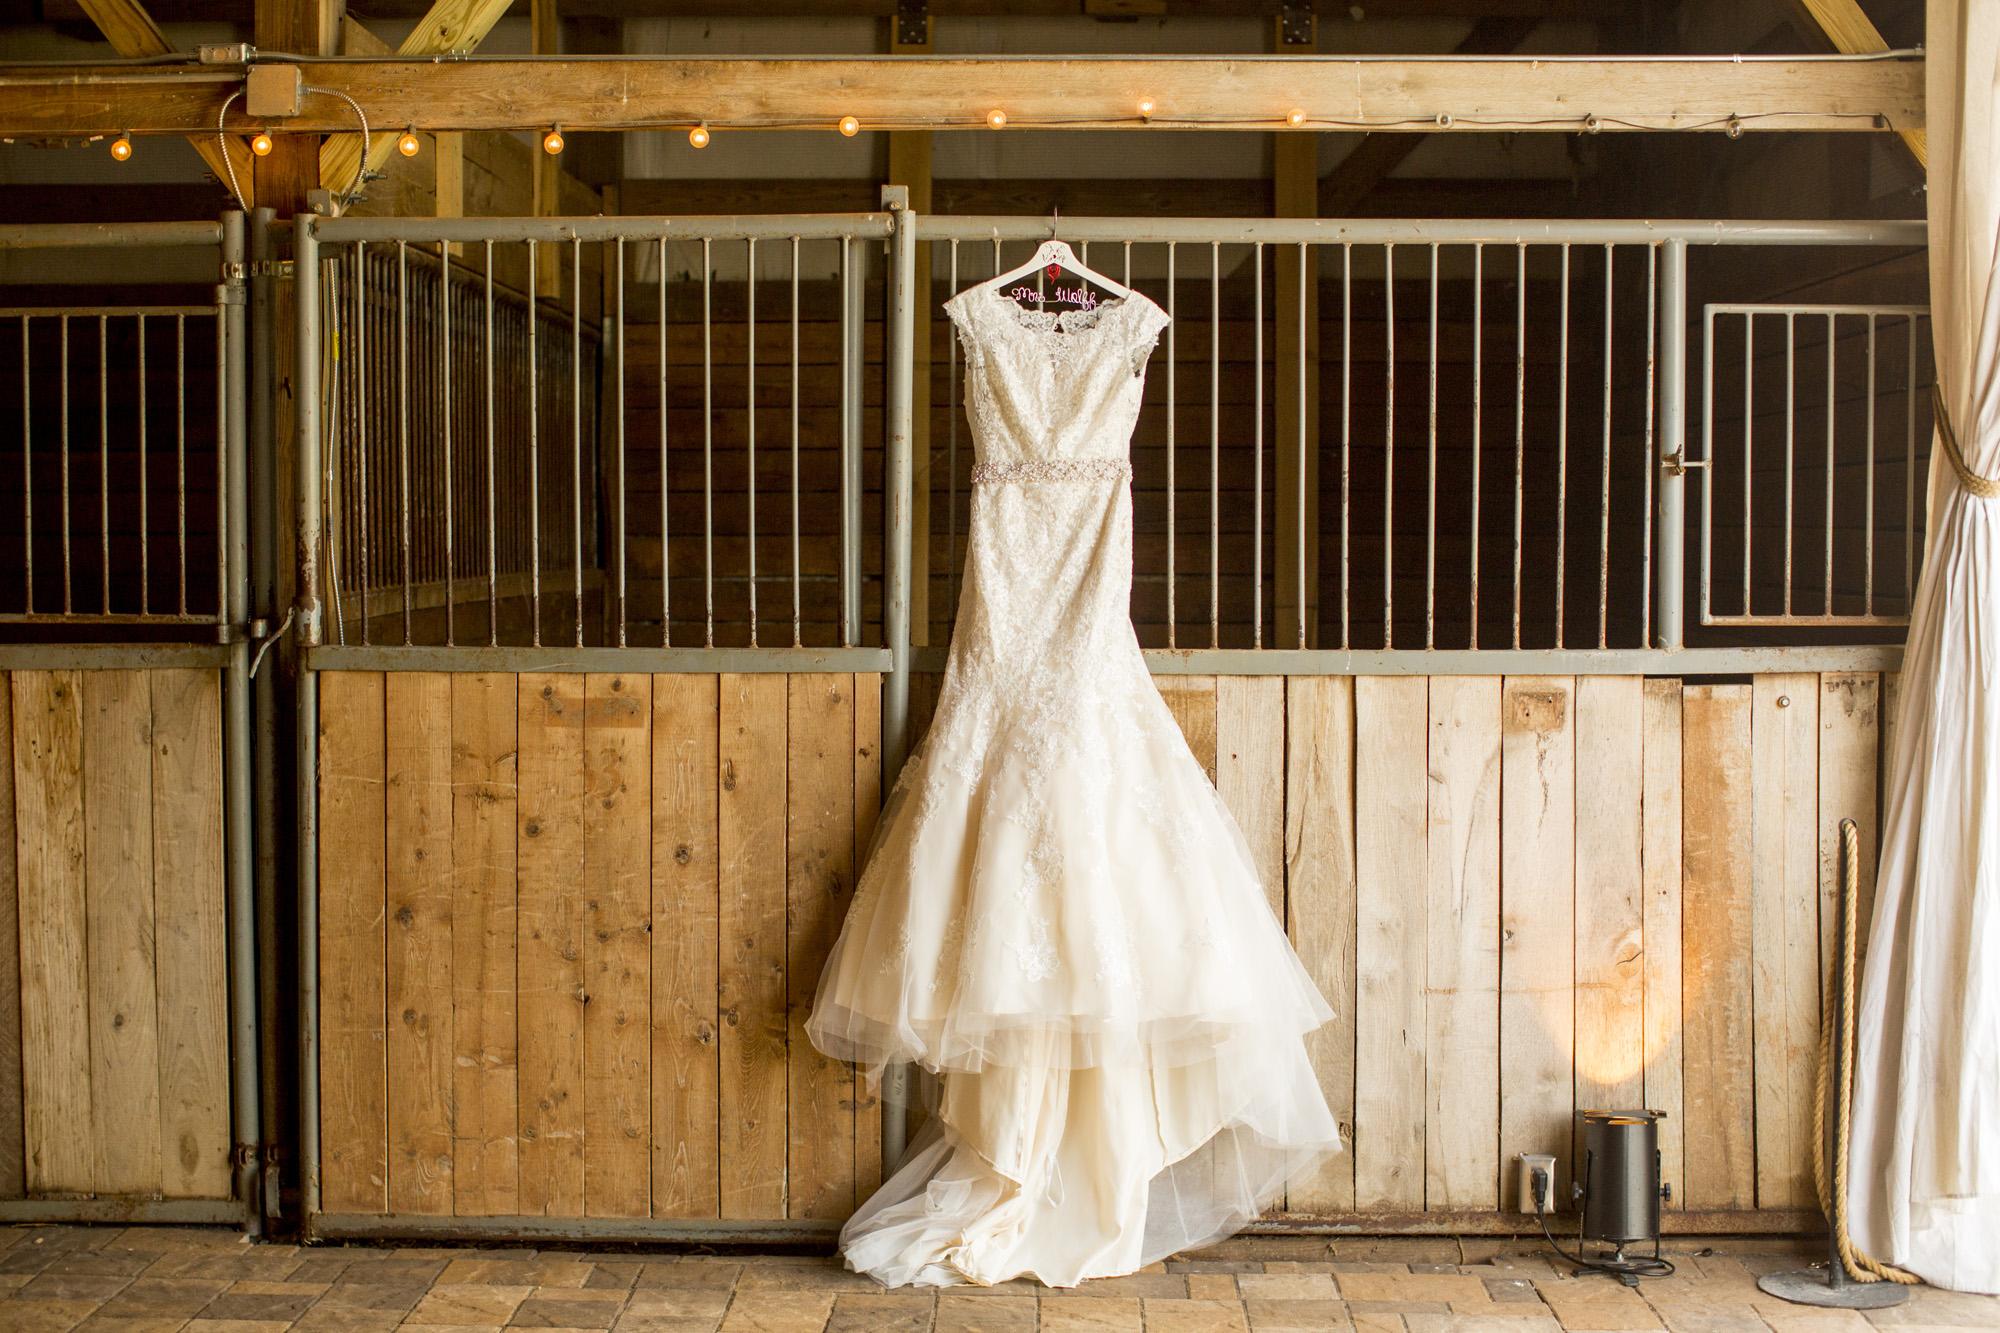 Seriously_Sabrina_Photography_Bowling_Green_Kentucky_Highland_Stables_Wedding_Wolff2.jpg